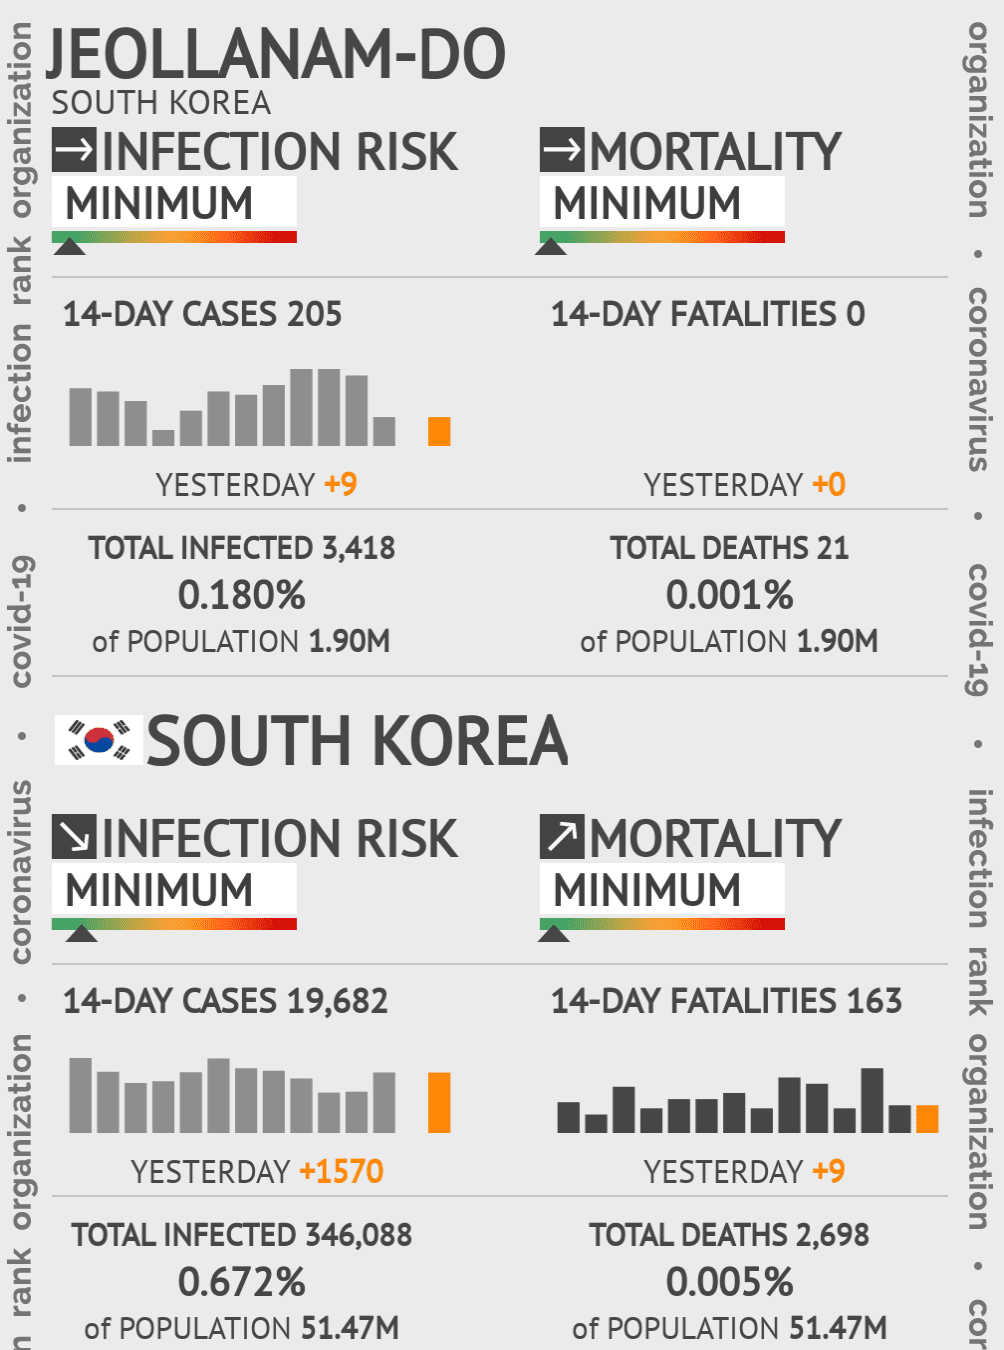 Jeollanam-do Coronavirus Covid-19 Risk of Infection on February 26, 2021